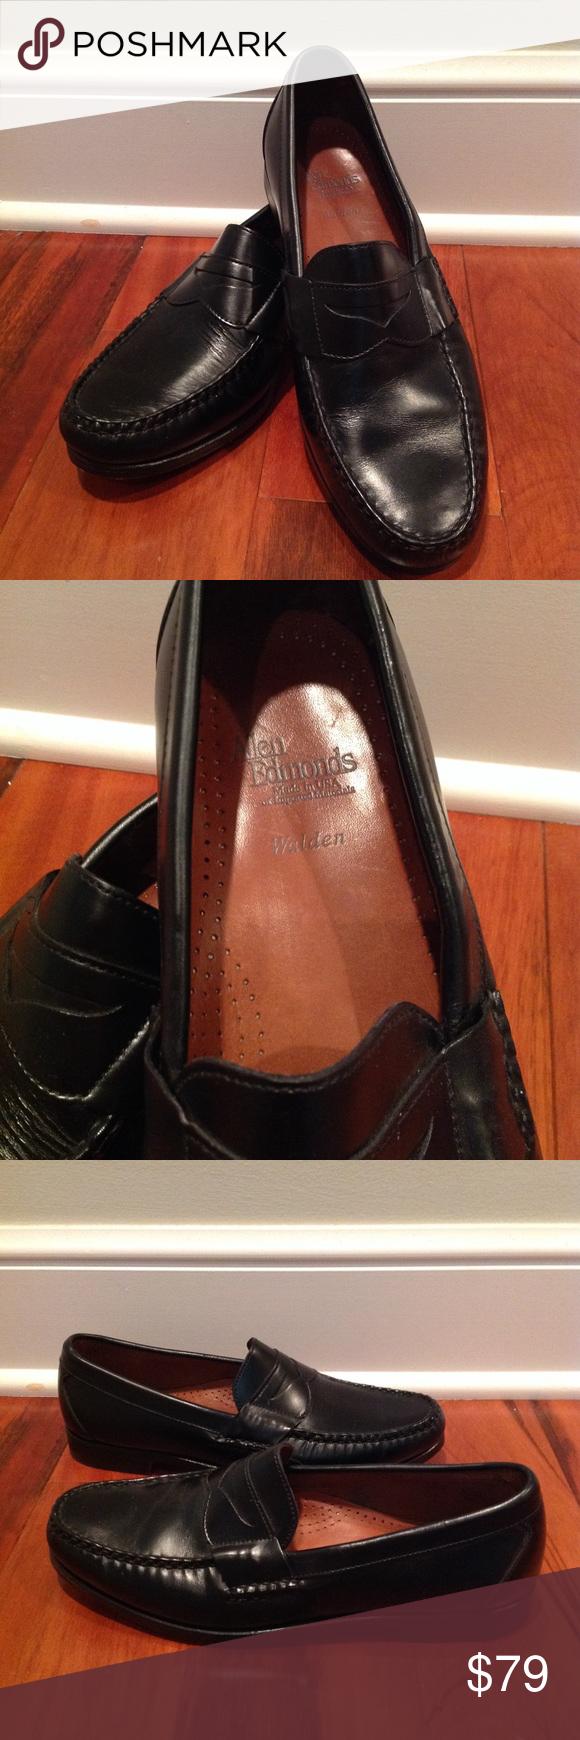 a0a13bd9970 Allen Edmonds  Walden  Black Penny Loafers 9.5 Beautiful Allen Edmonds  style. Classic black